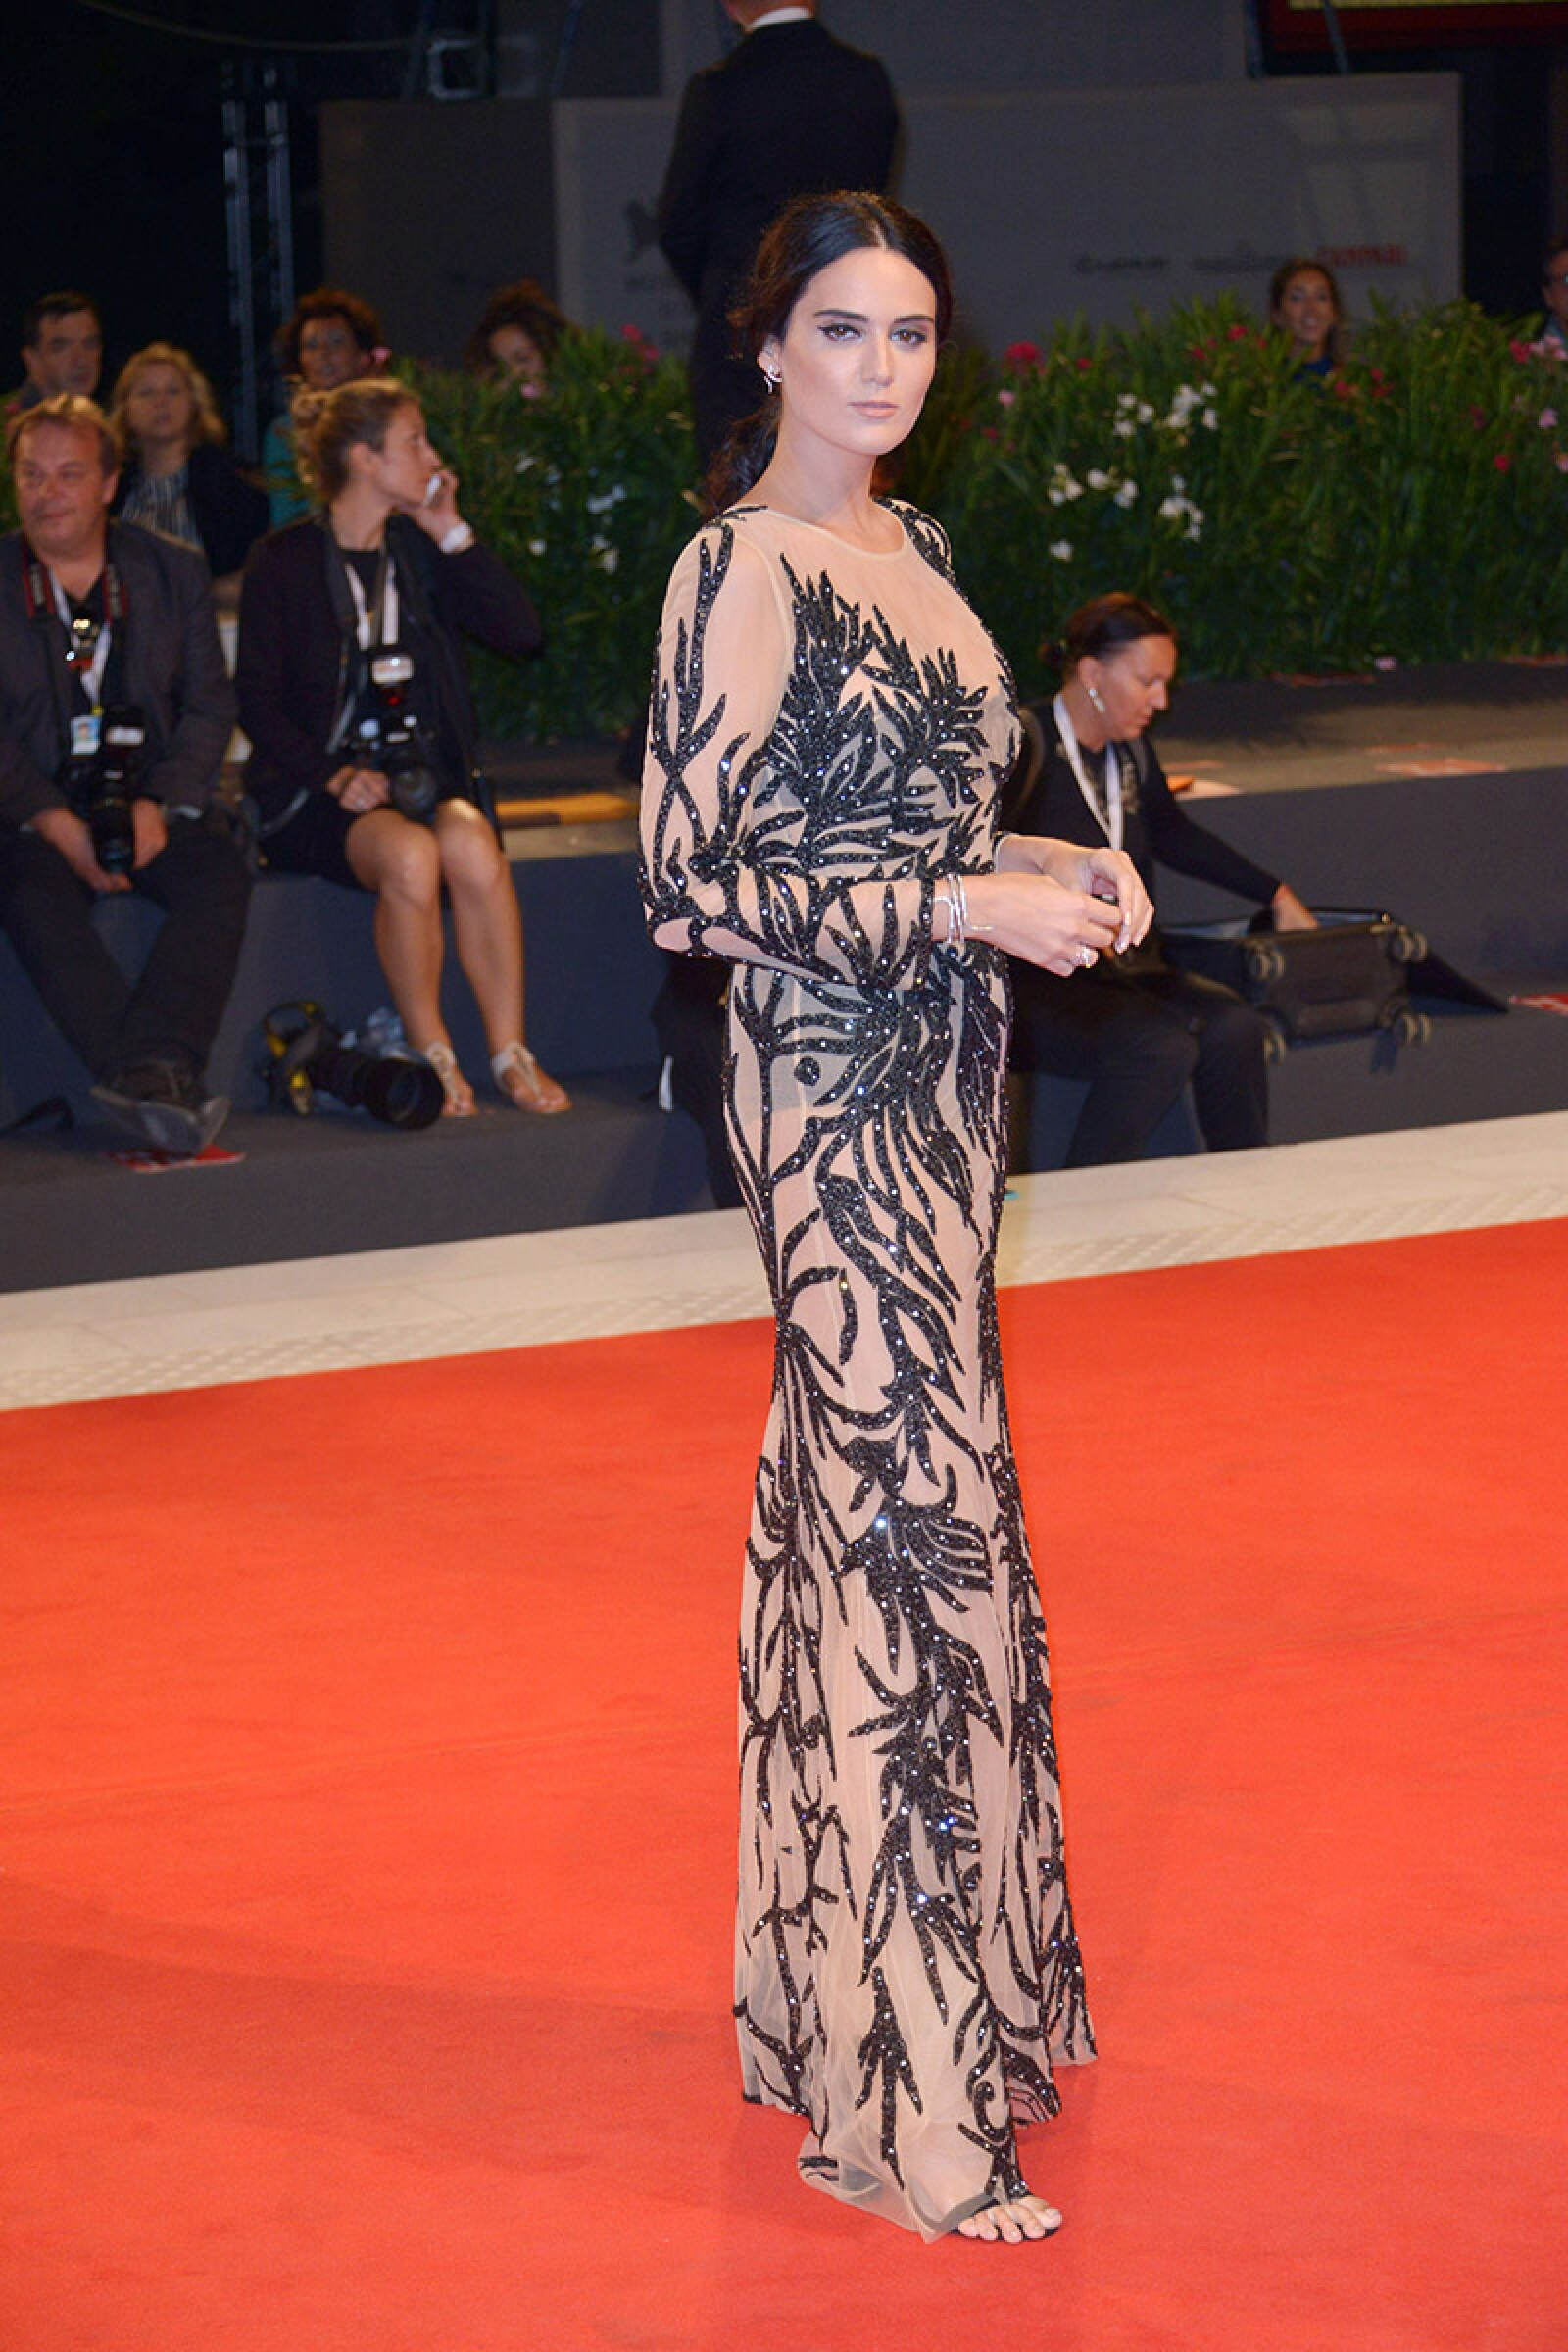 'Never Look Away' premiere, 75th Venice International Film Festival, Italy  - 04 Sep 2018